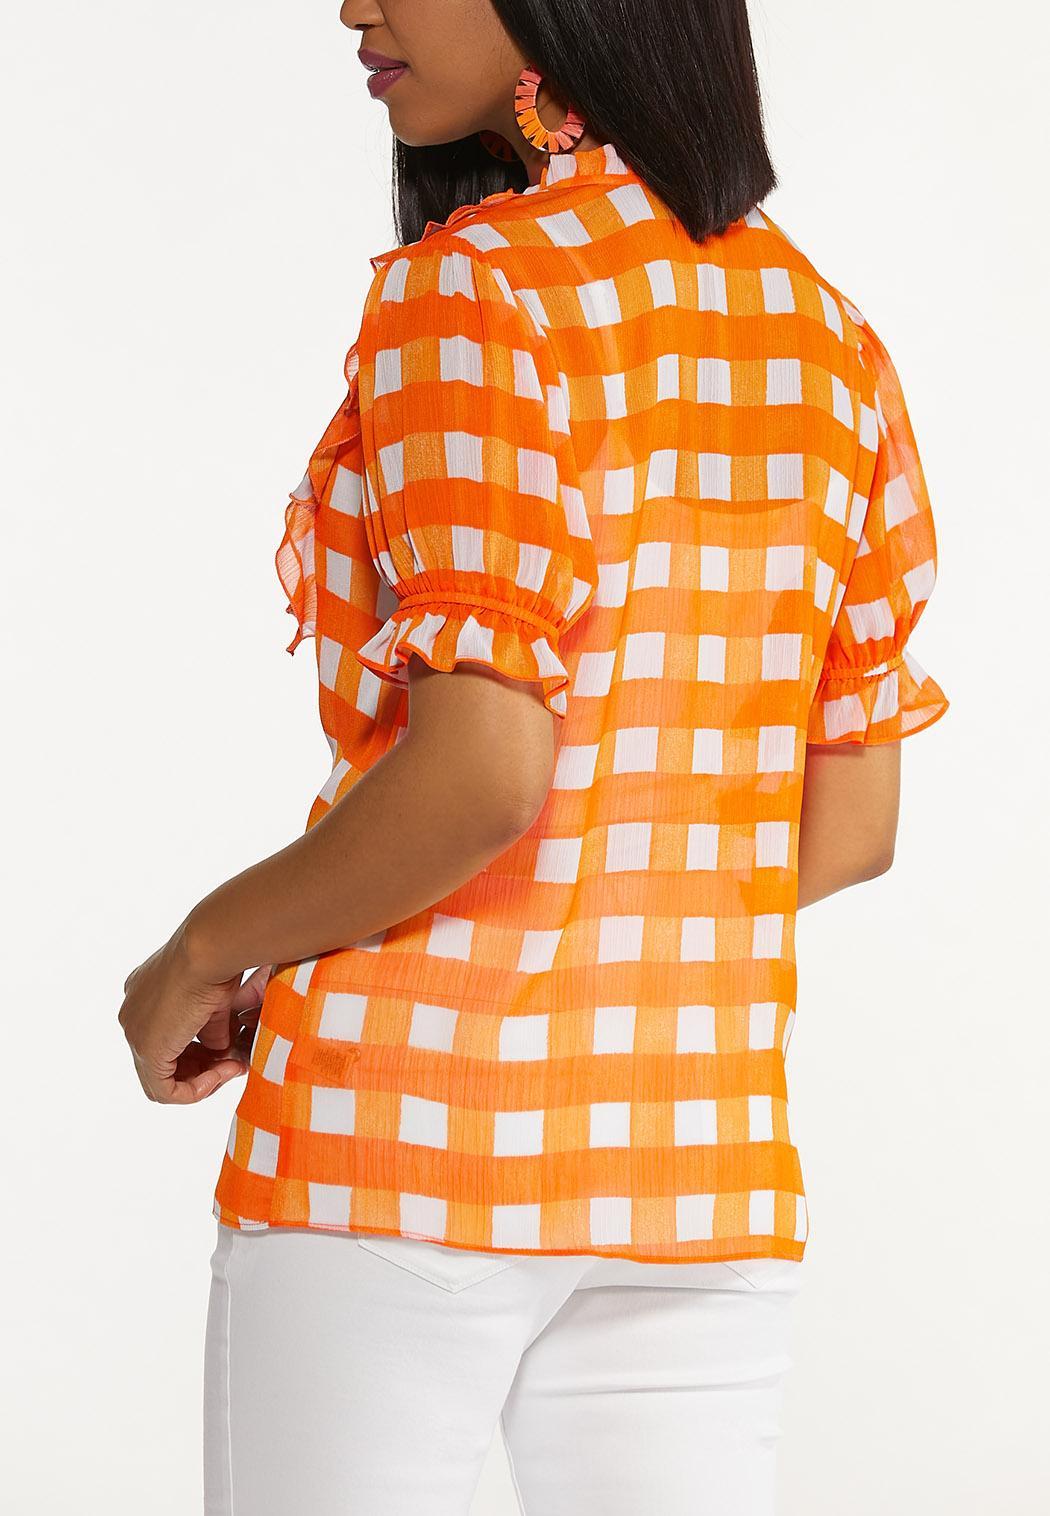 Orange Checkered Top (Item #44609259)